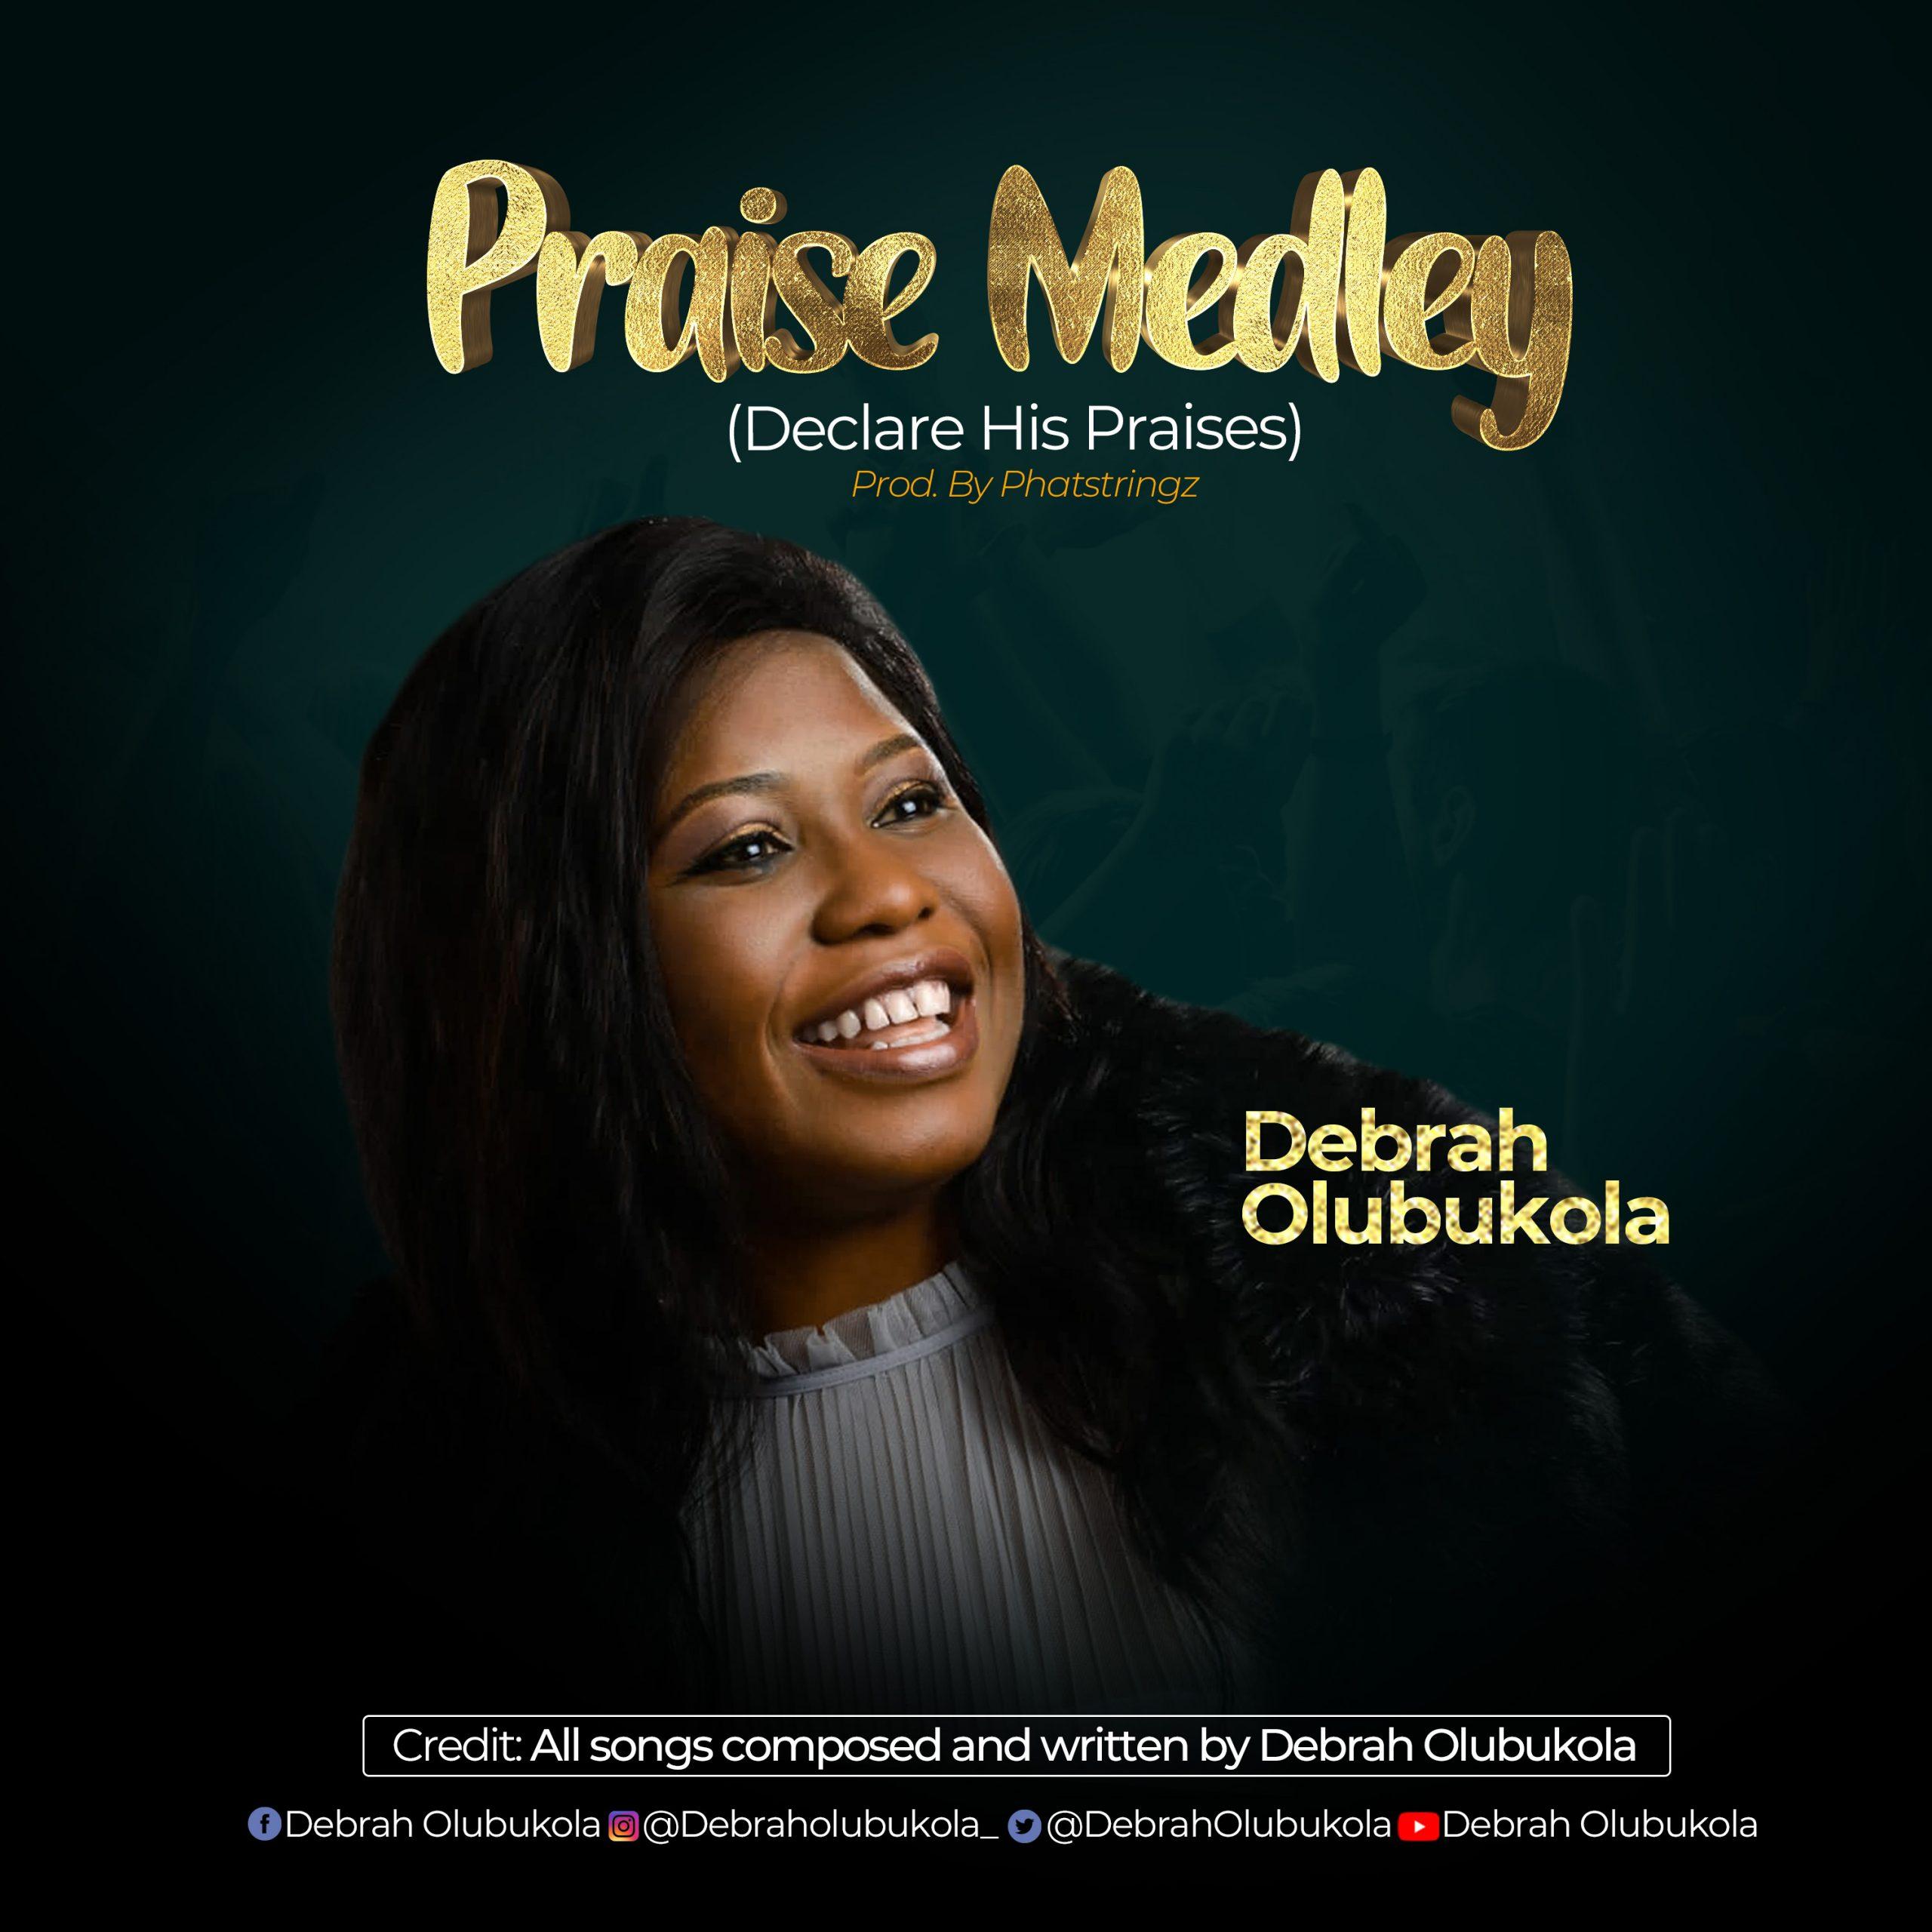 Debrah Olubukola Releases Praise Medley